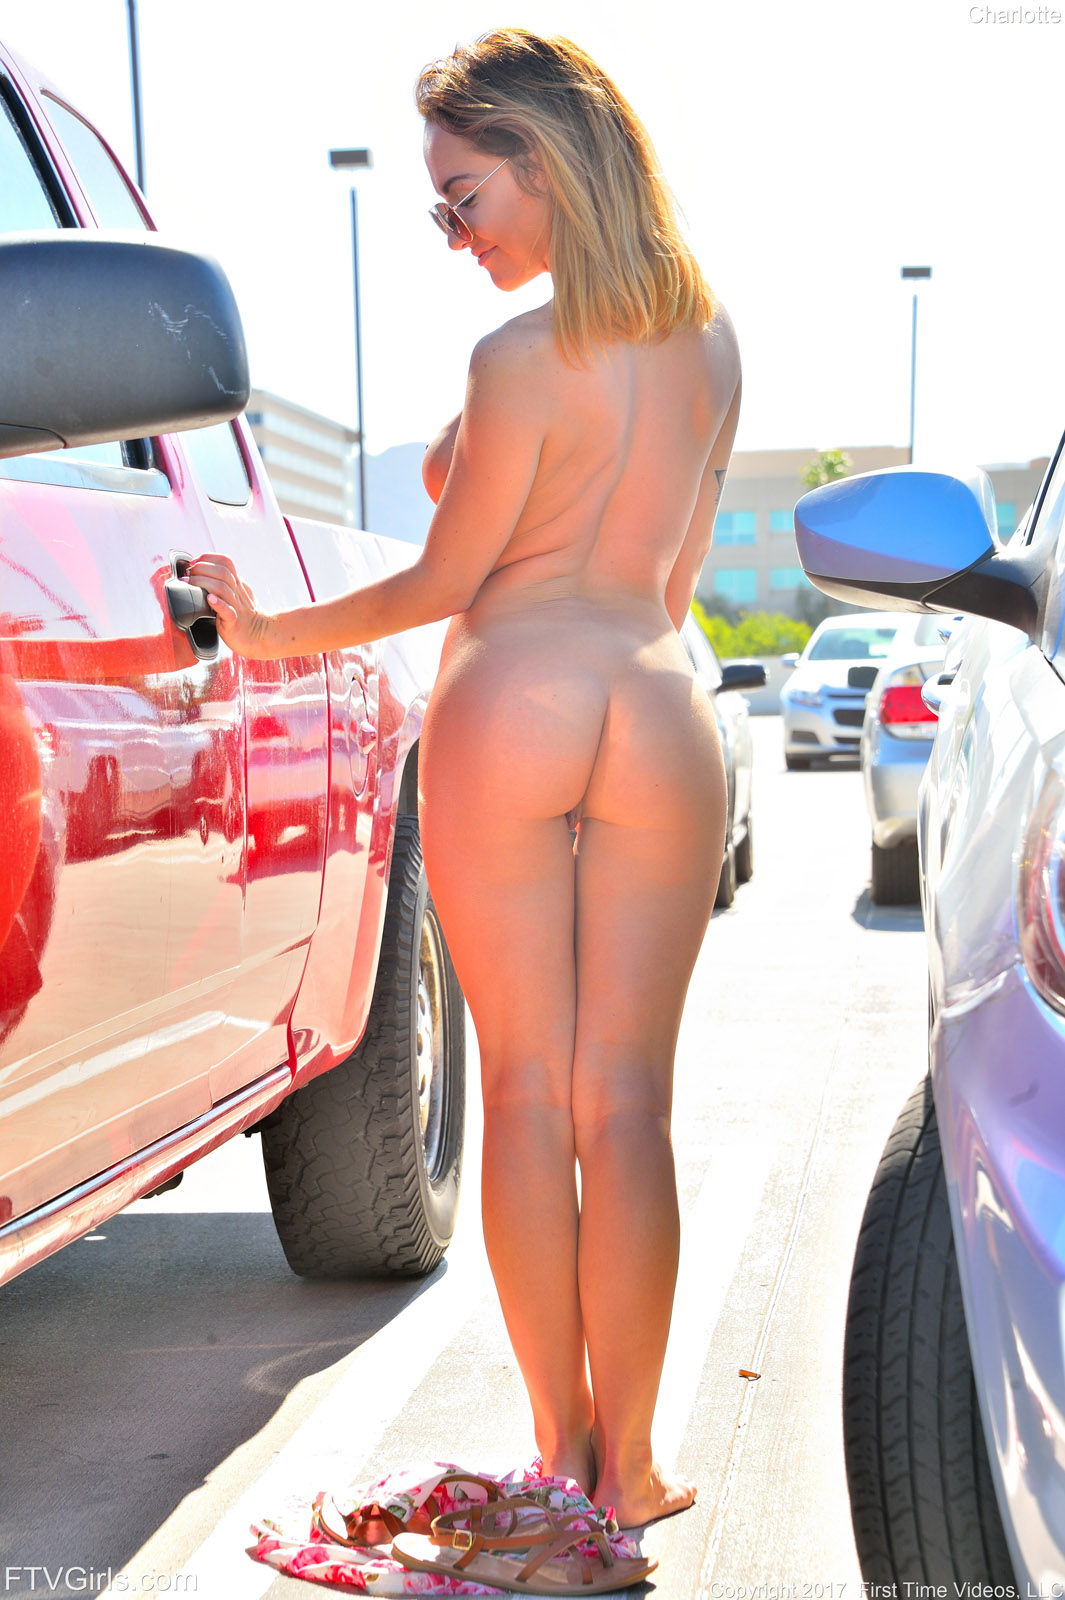 Charlotte FTV Girls Sporty Nudes